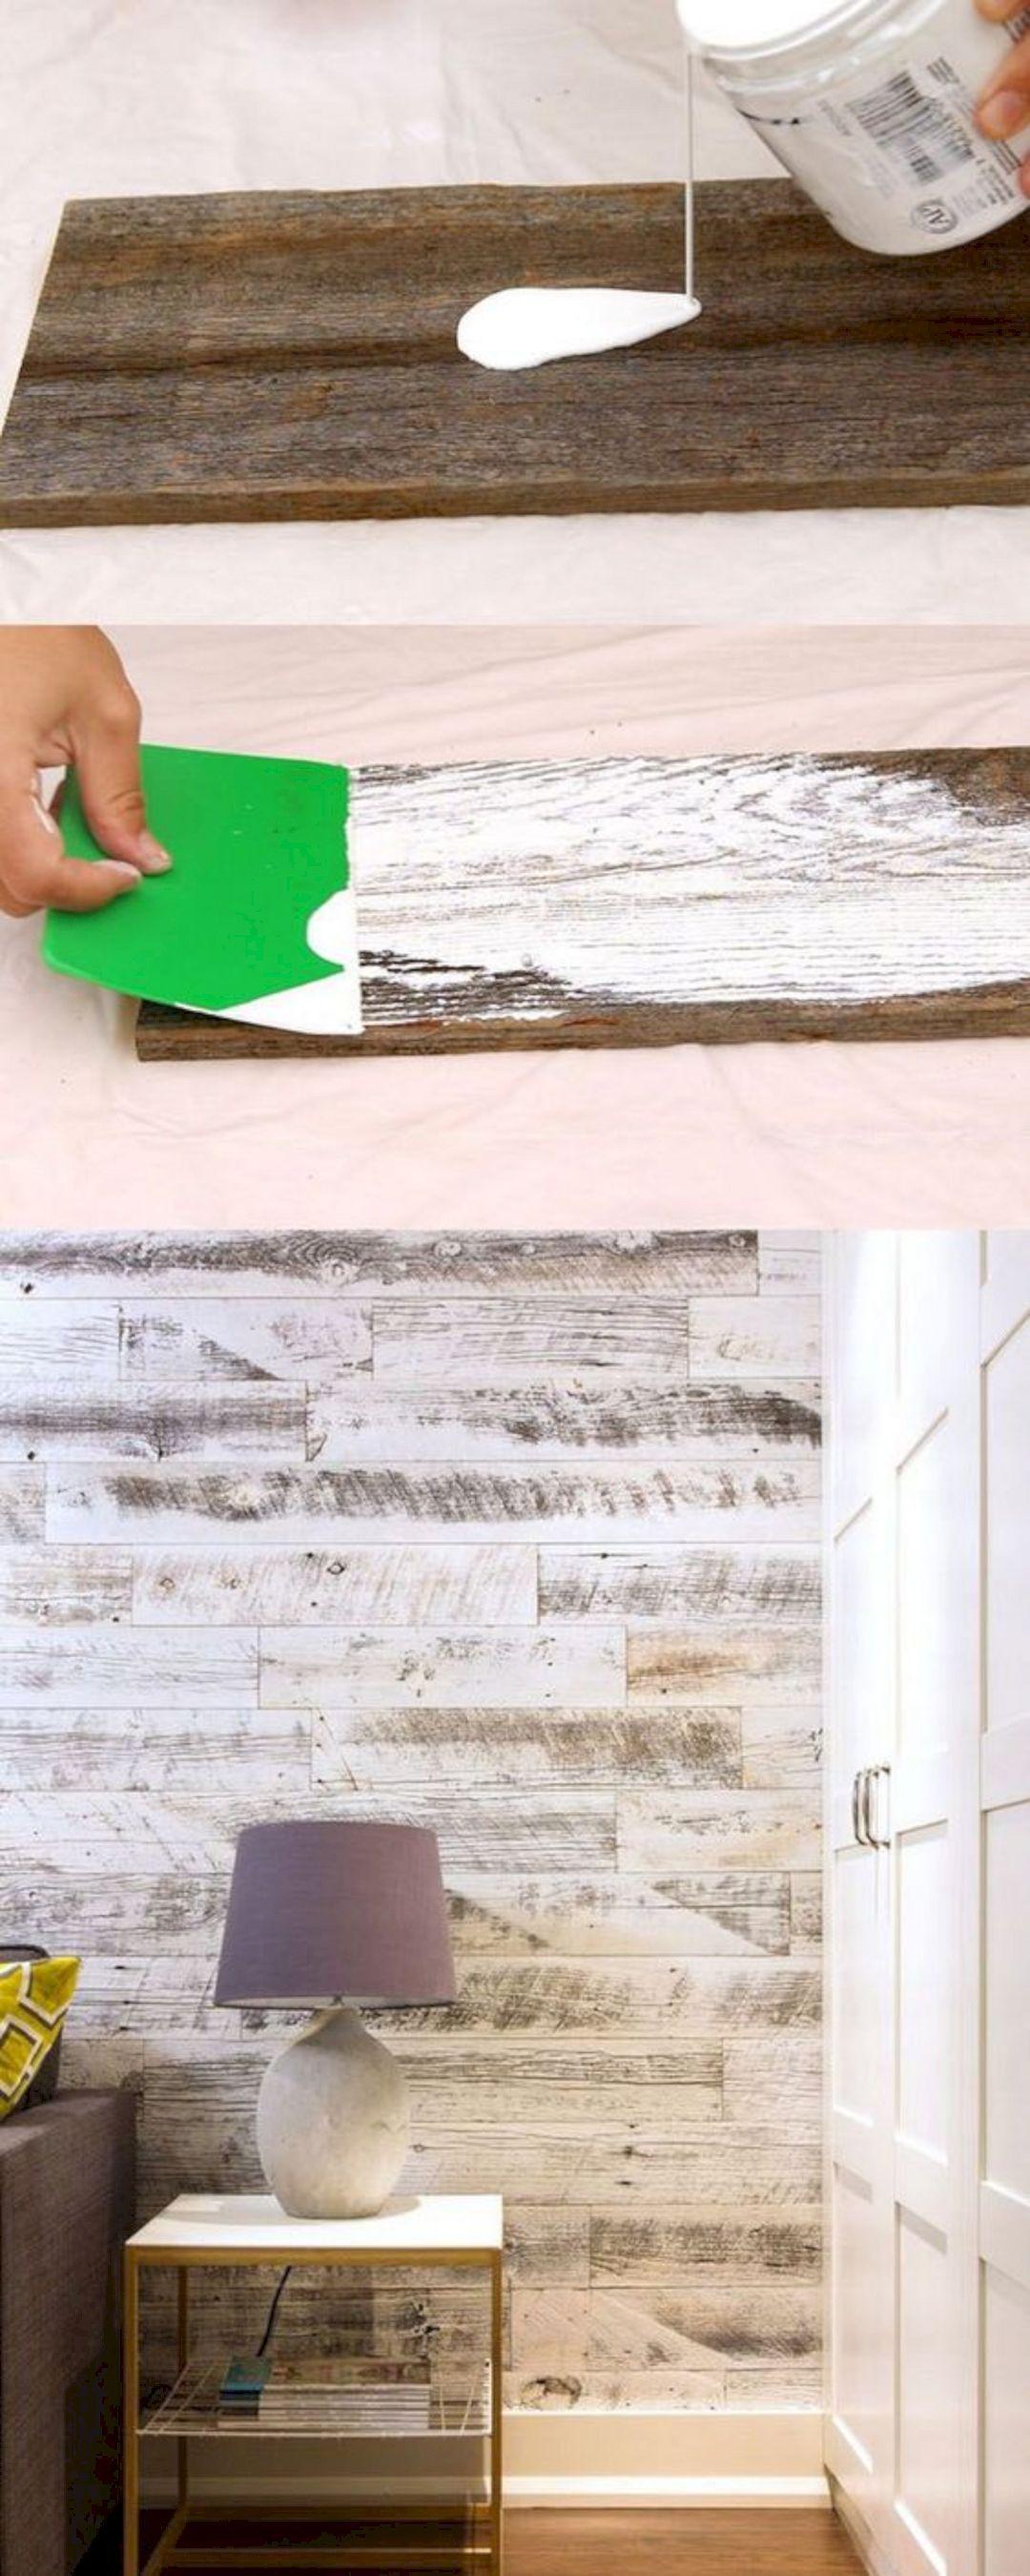 Incroyable 16 Creative DIY Home Decorating Ideas |